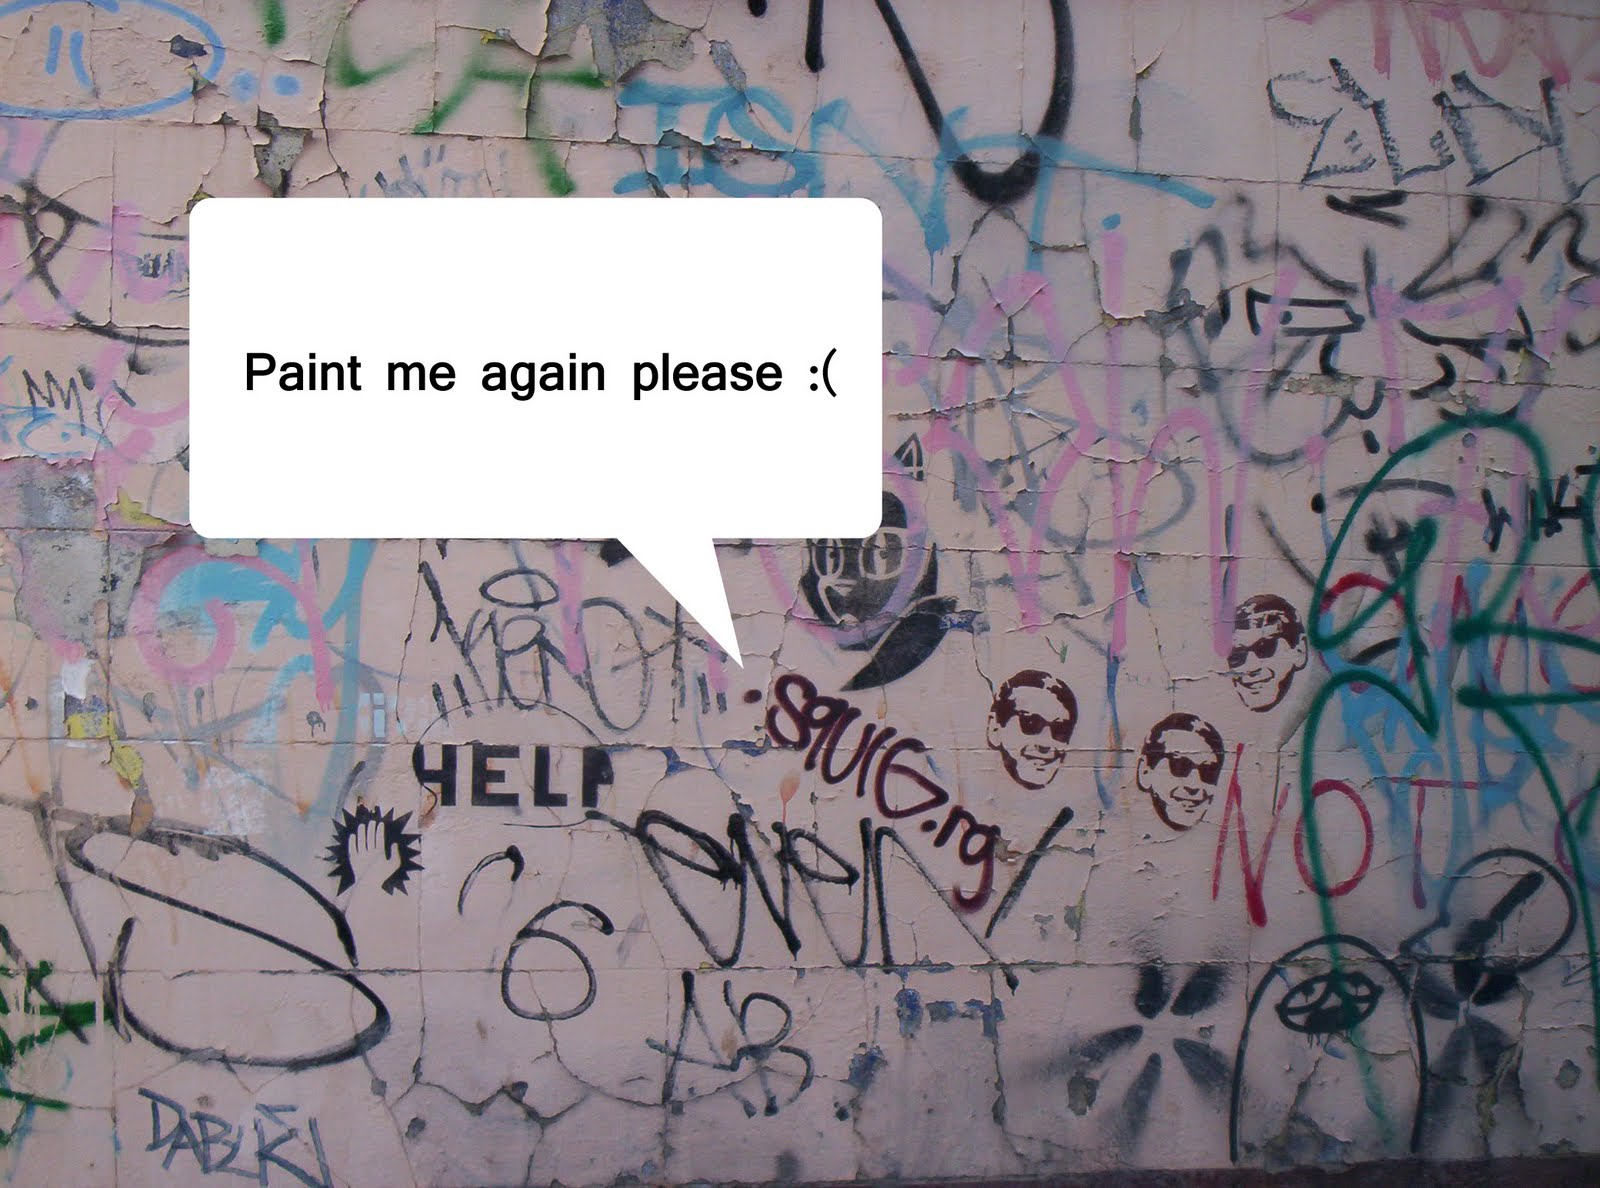 http://1.bp.blogspot.com/_GK51bQtyB0Y/TGO0QpppcmI/AAAAAAAAAEo/Y0bF3yF44Tk/s1600/Graffiti_wall_Melbourne_2005%2Bcopy.jpg